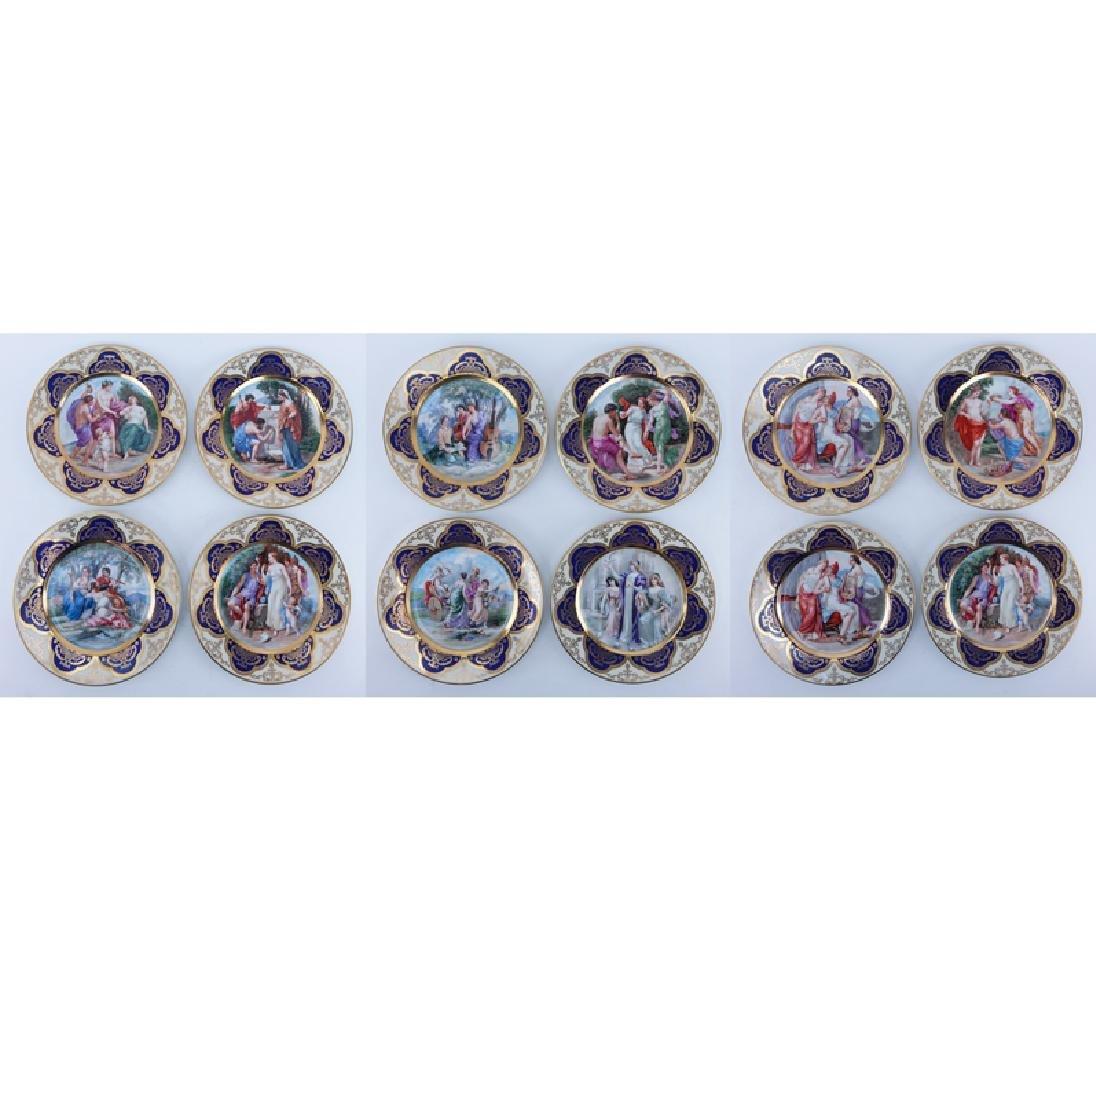 Set of Twelve (12) Limoges Royal Vienna Style Plates